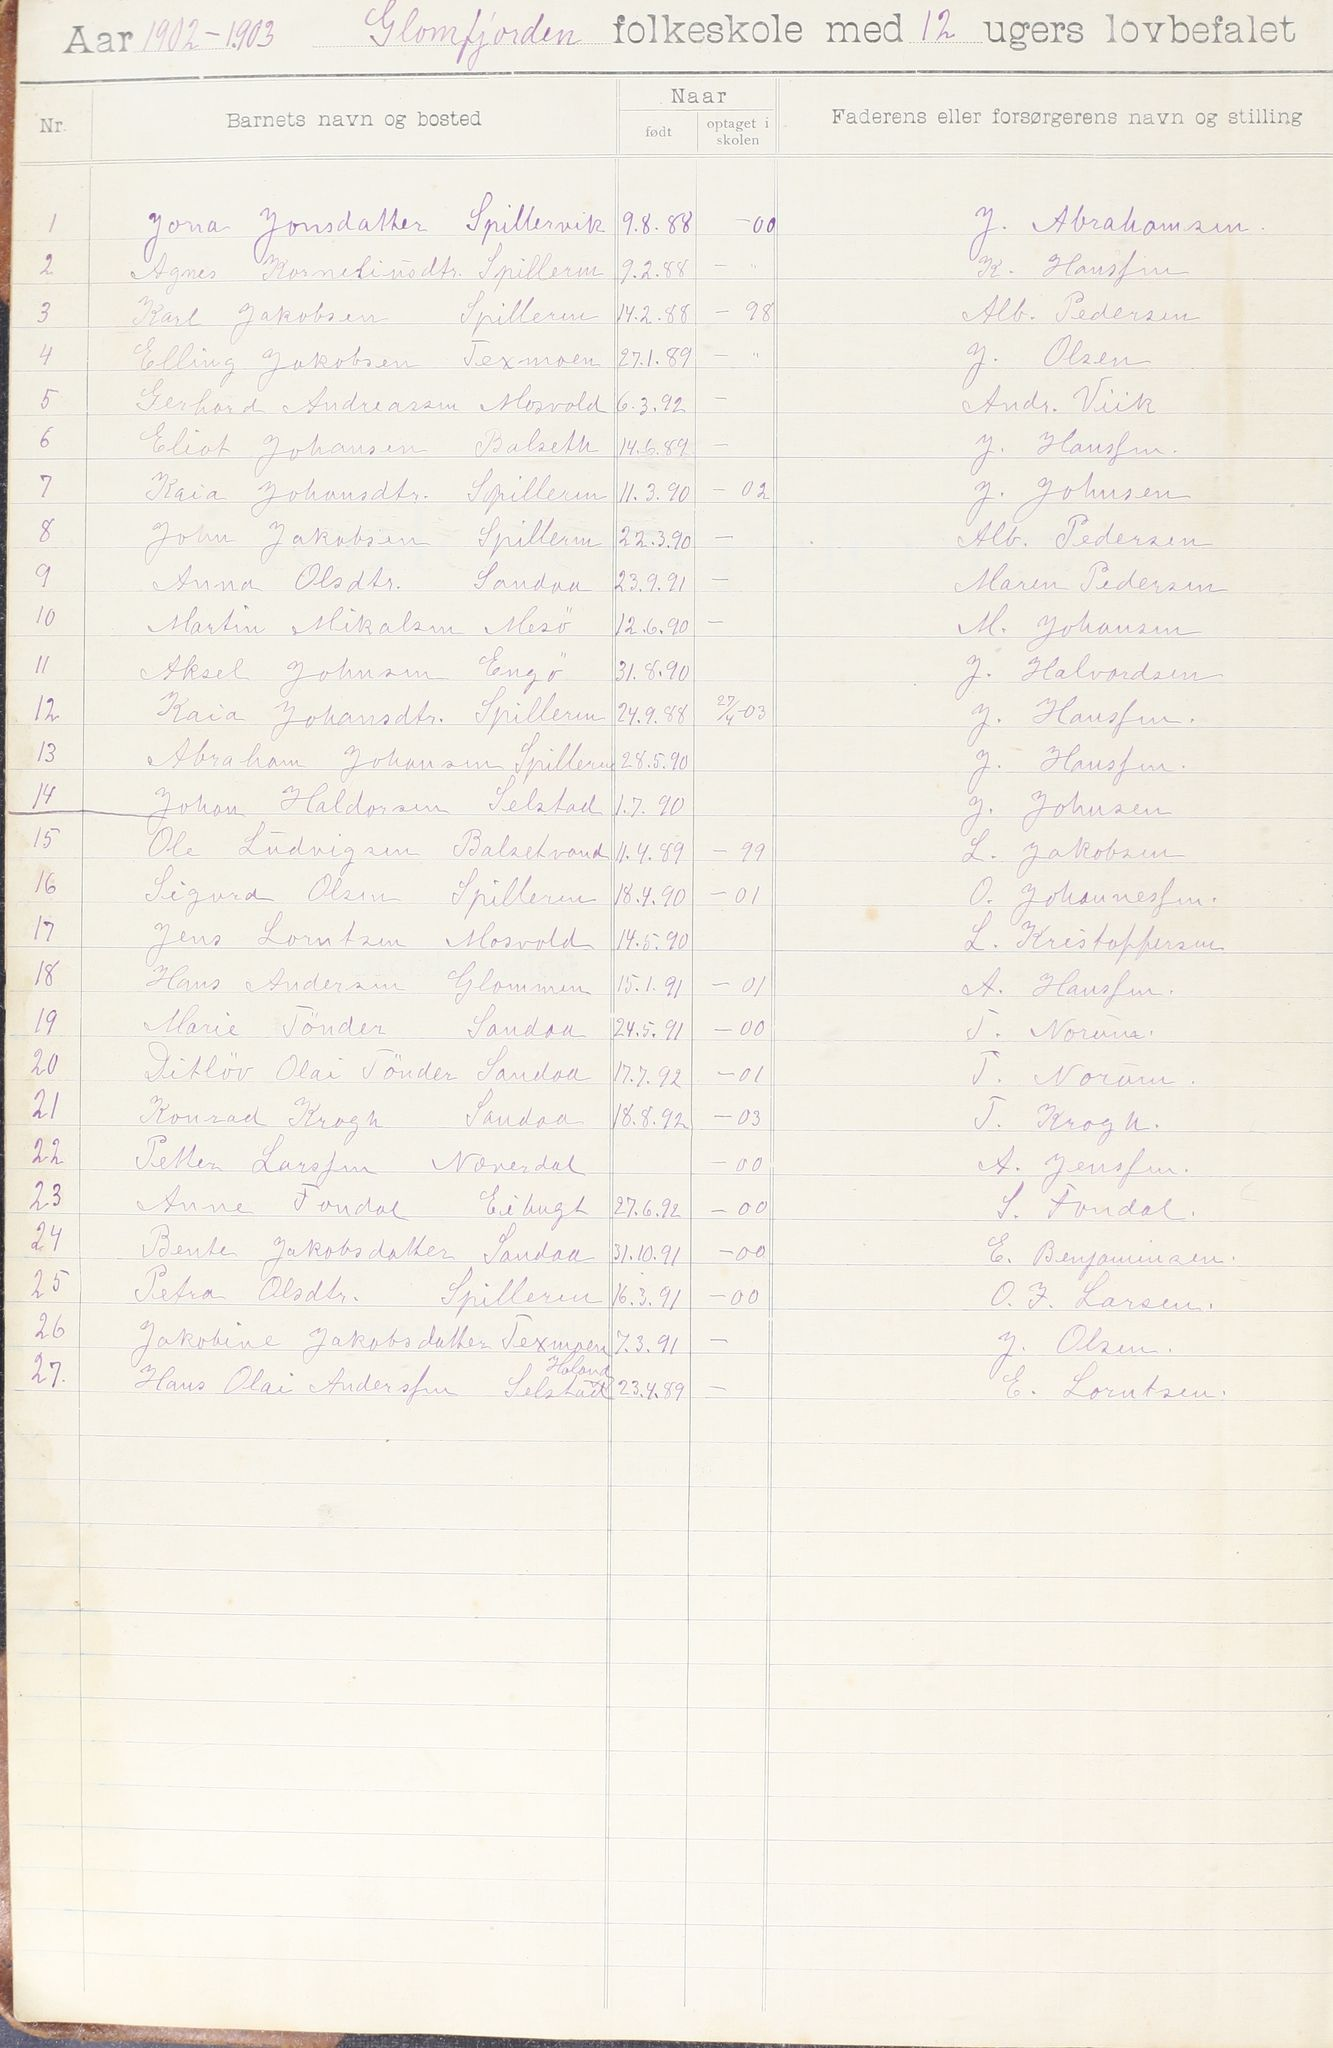 AIN, Meløy kommune. Glomfjord skolekrets, 442/L0002: Protokoll, 1902-1917